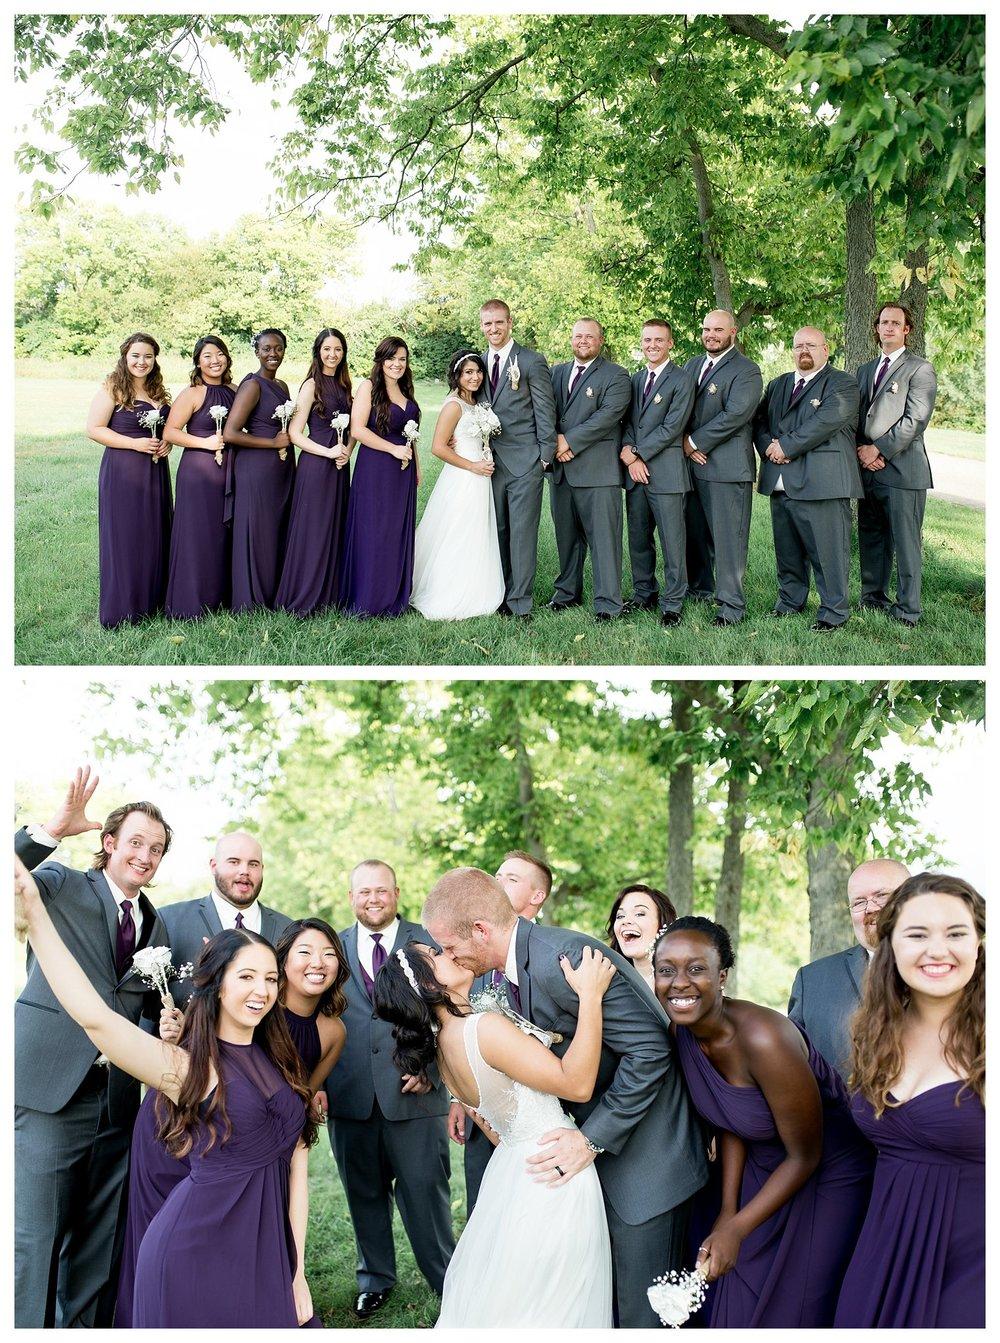 everleigh-photography-cincinnati-wedding-photographer-lake-lyndsay-wedding-hamilton-ohio_21